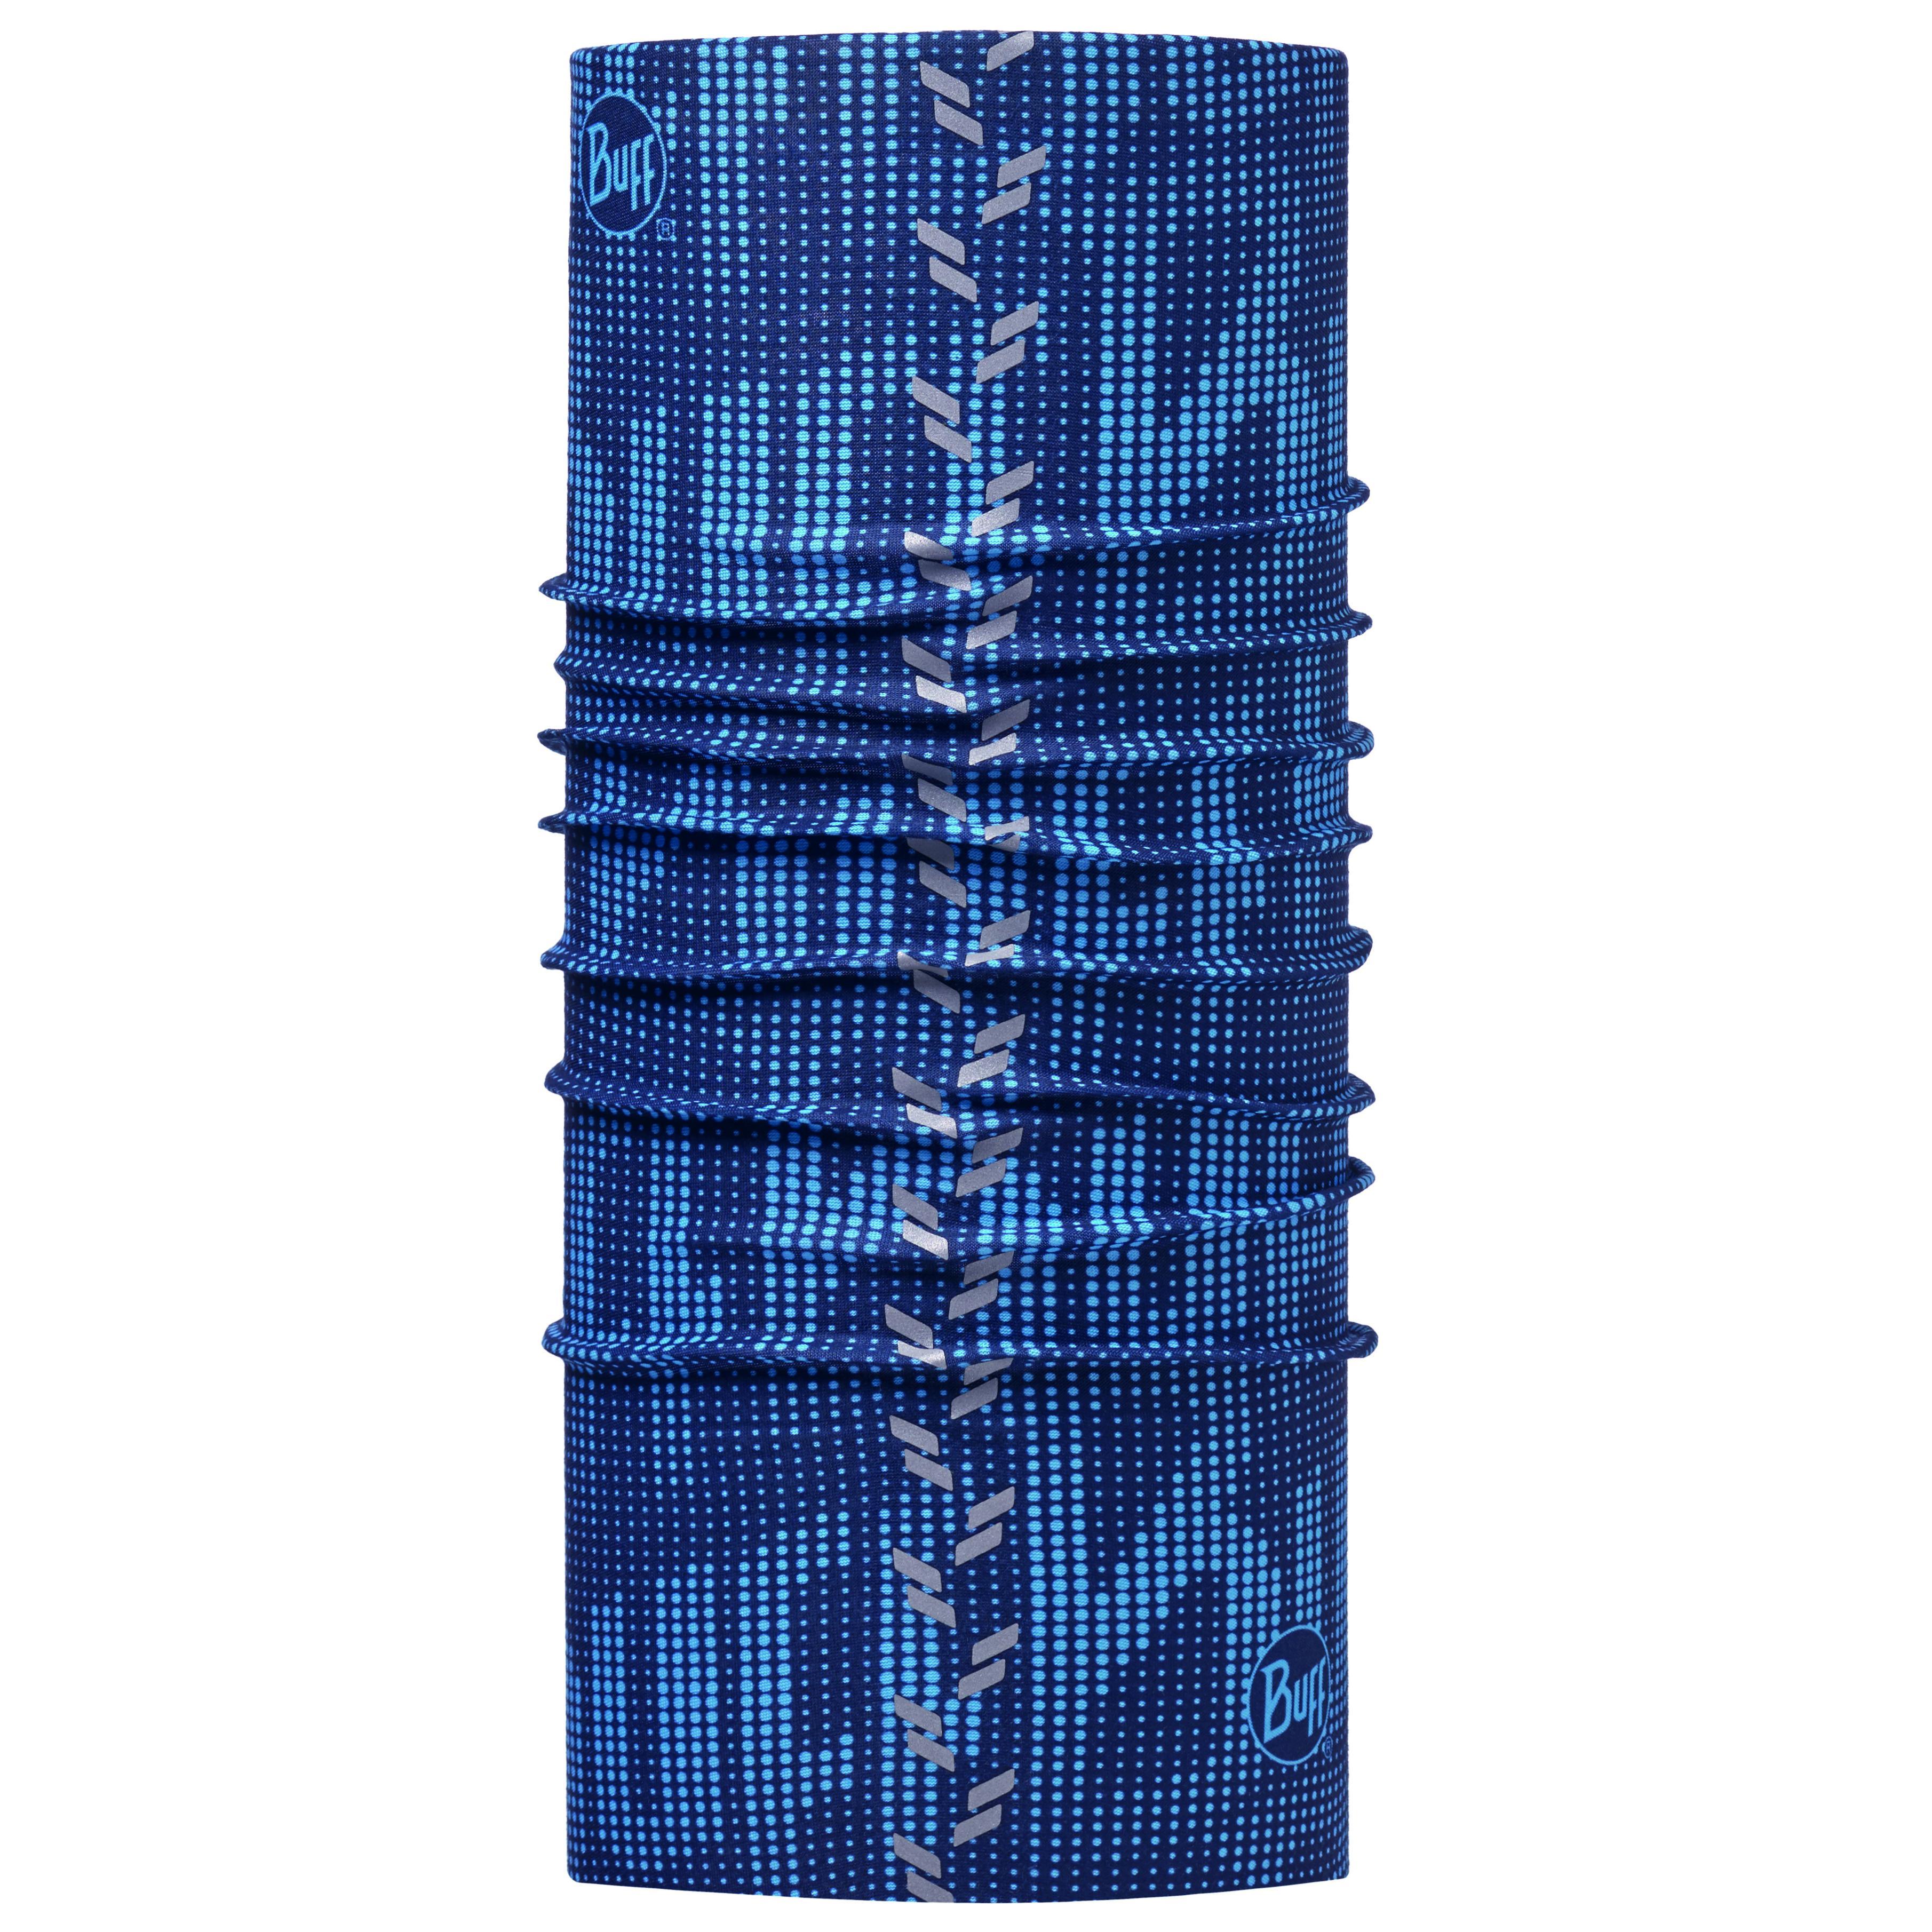 Купить Бандана BUFF REFLECTIVE R-DEEP LOGO DARK NAVY Банданы и шарфы Buff ® 1266801